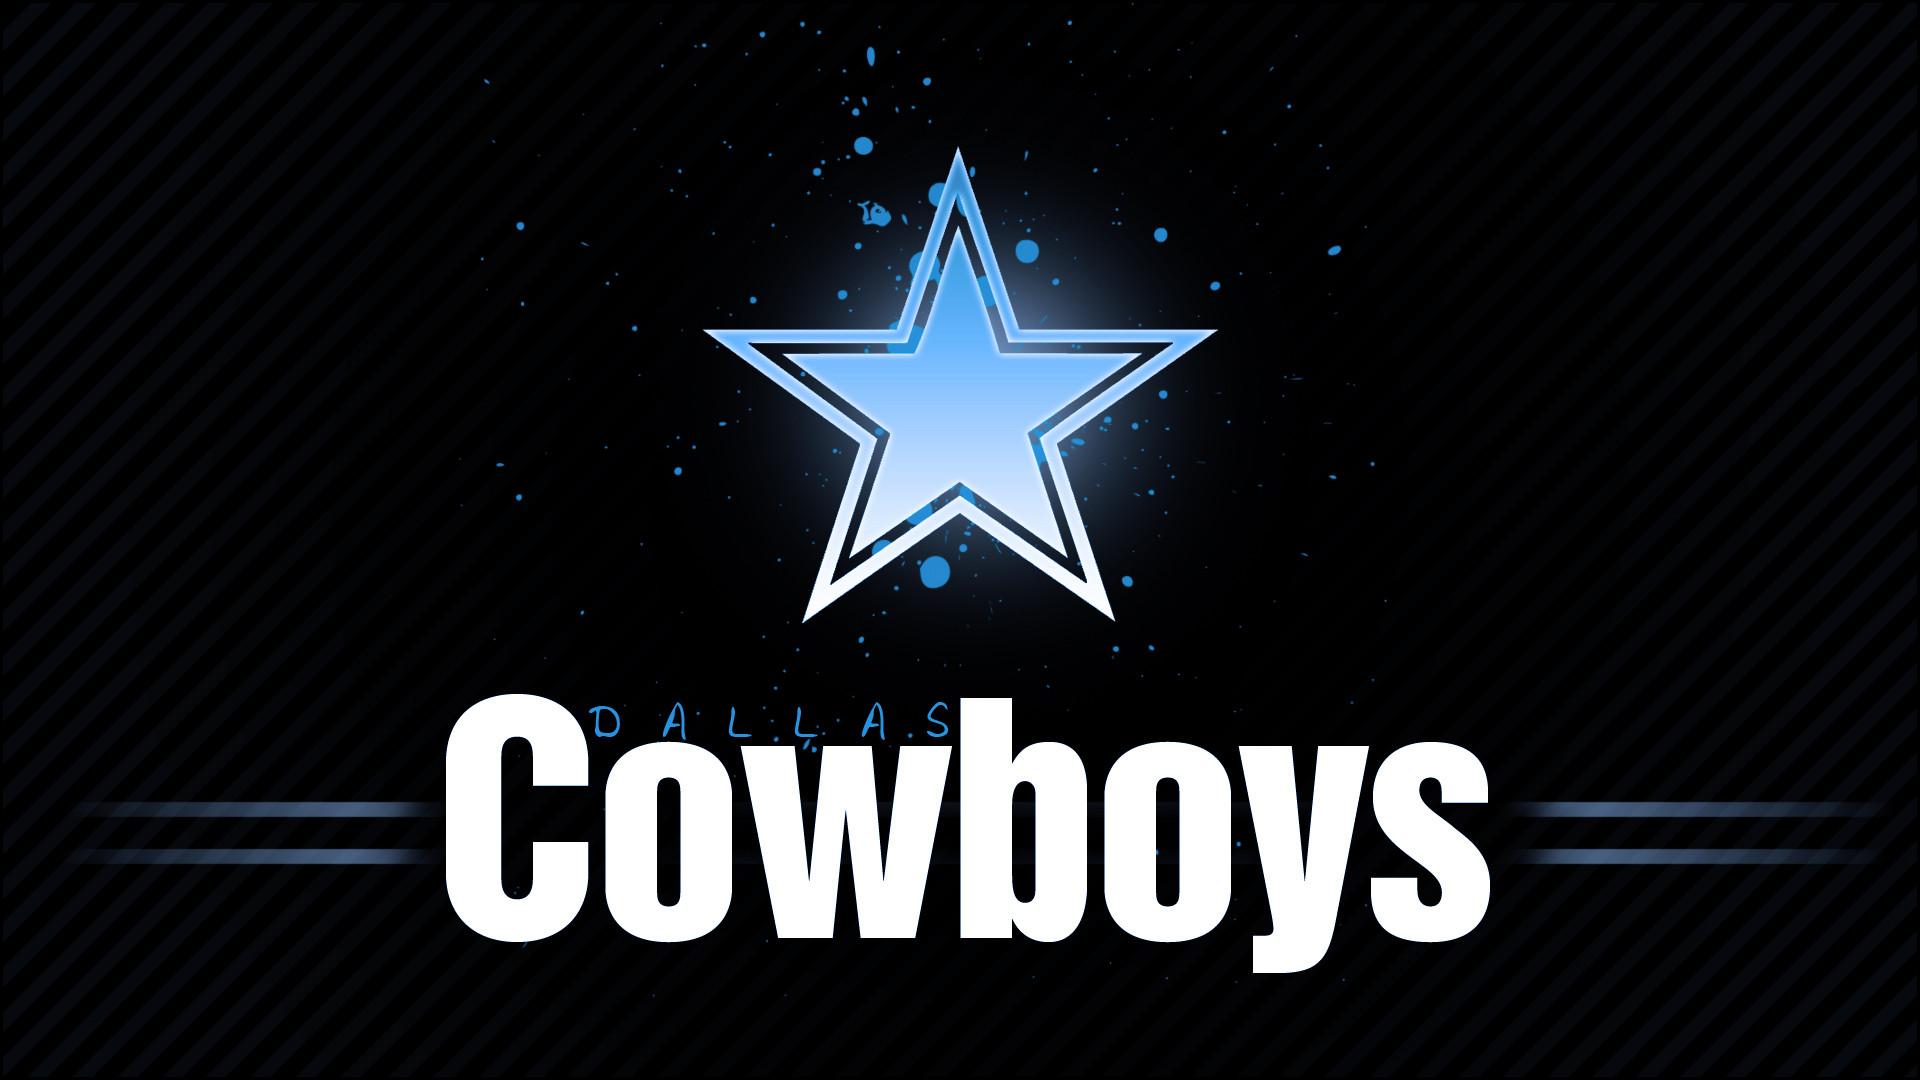 Dallas Cowboys Wallpaper 10   1920 X 1080 stmednet 1920x1080